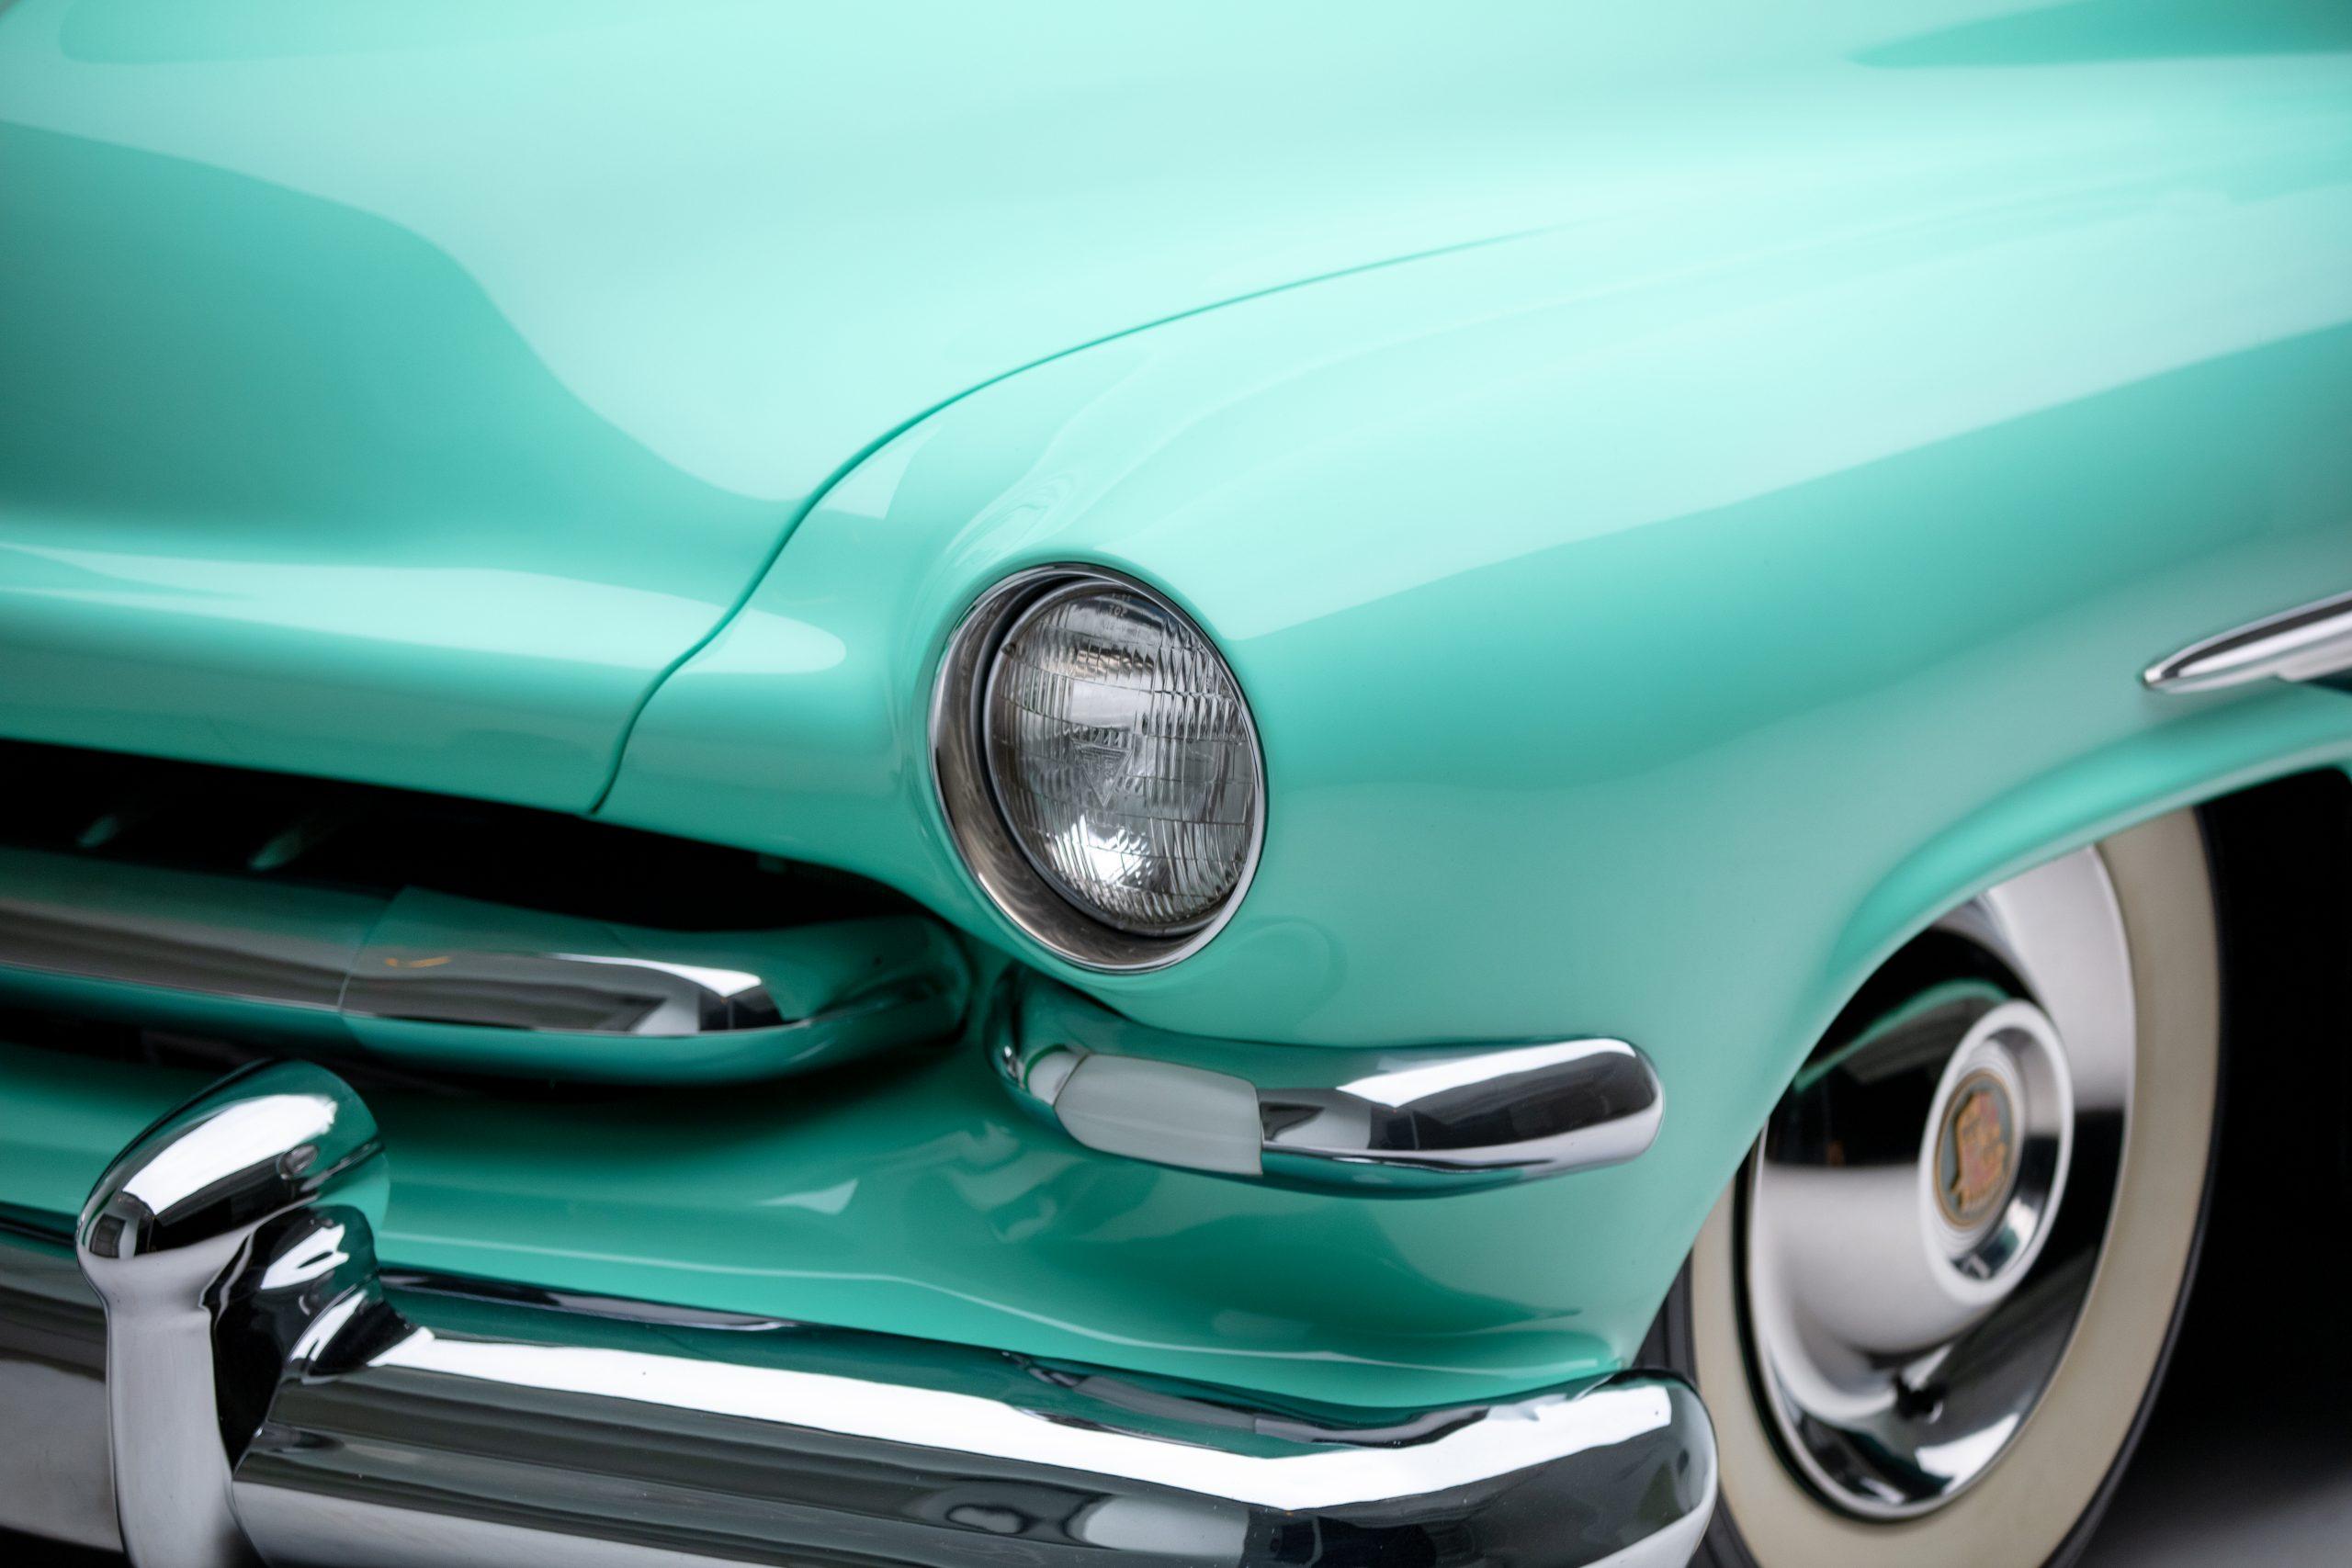 HVA Hirohata Mercury close-up drivers headlight